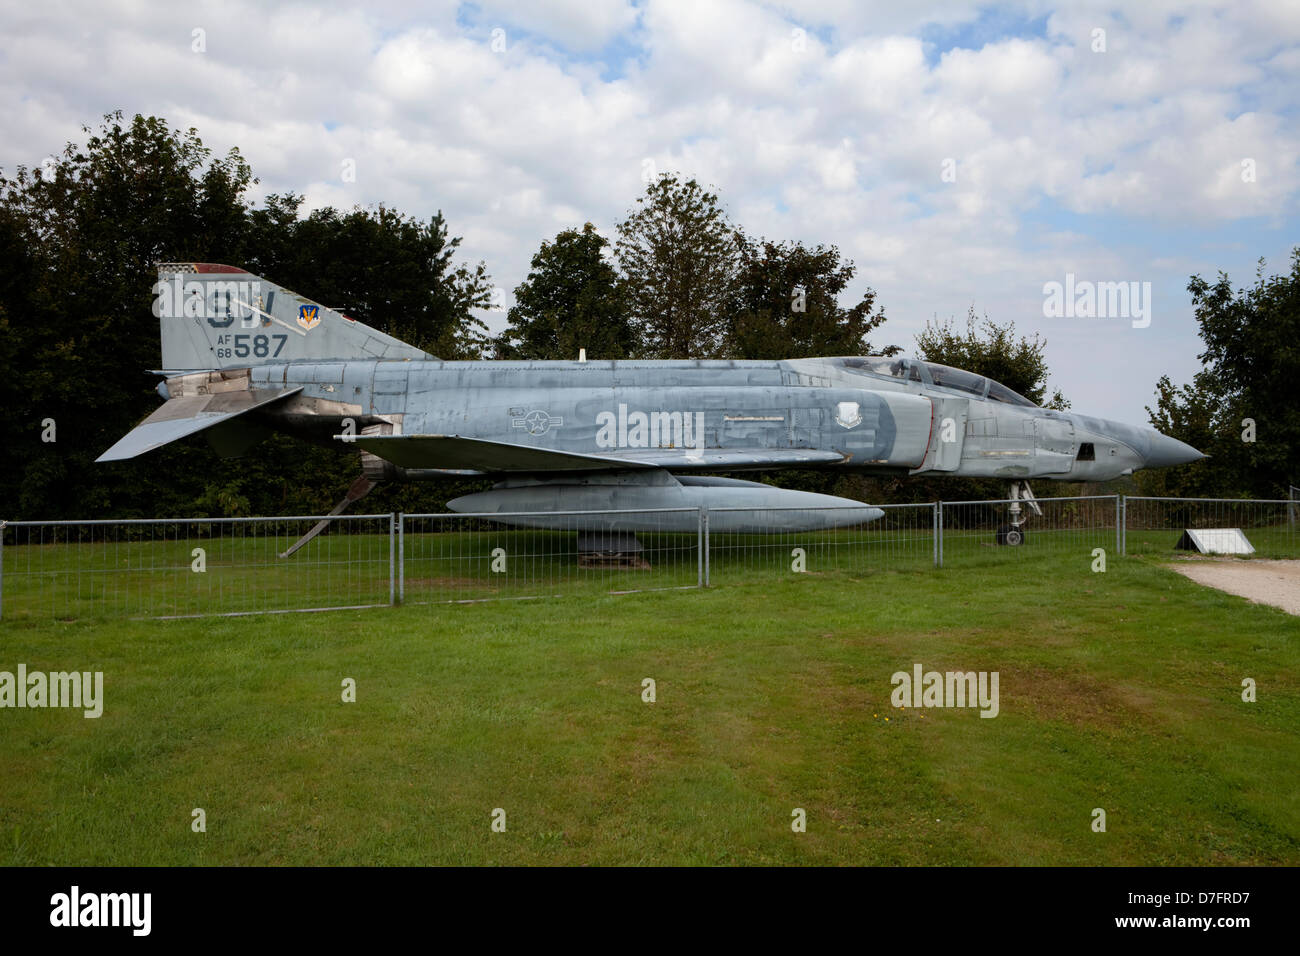 McDonnell RF-4C Phantom II , Aircraft Collection Hermeskeil, Germany, Europe - Stock Image